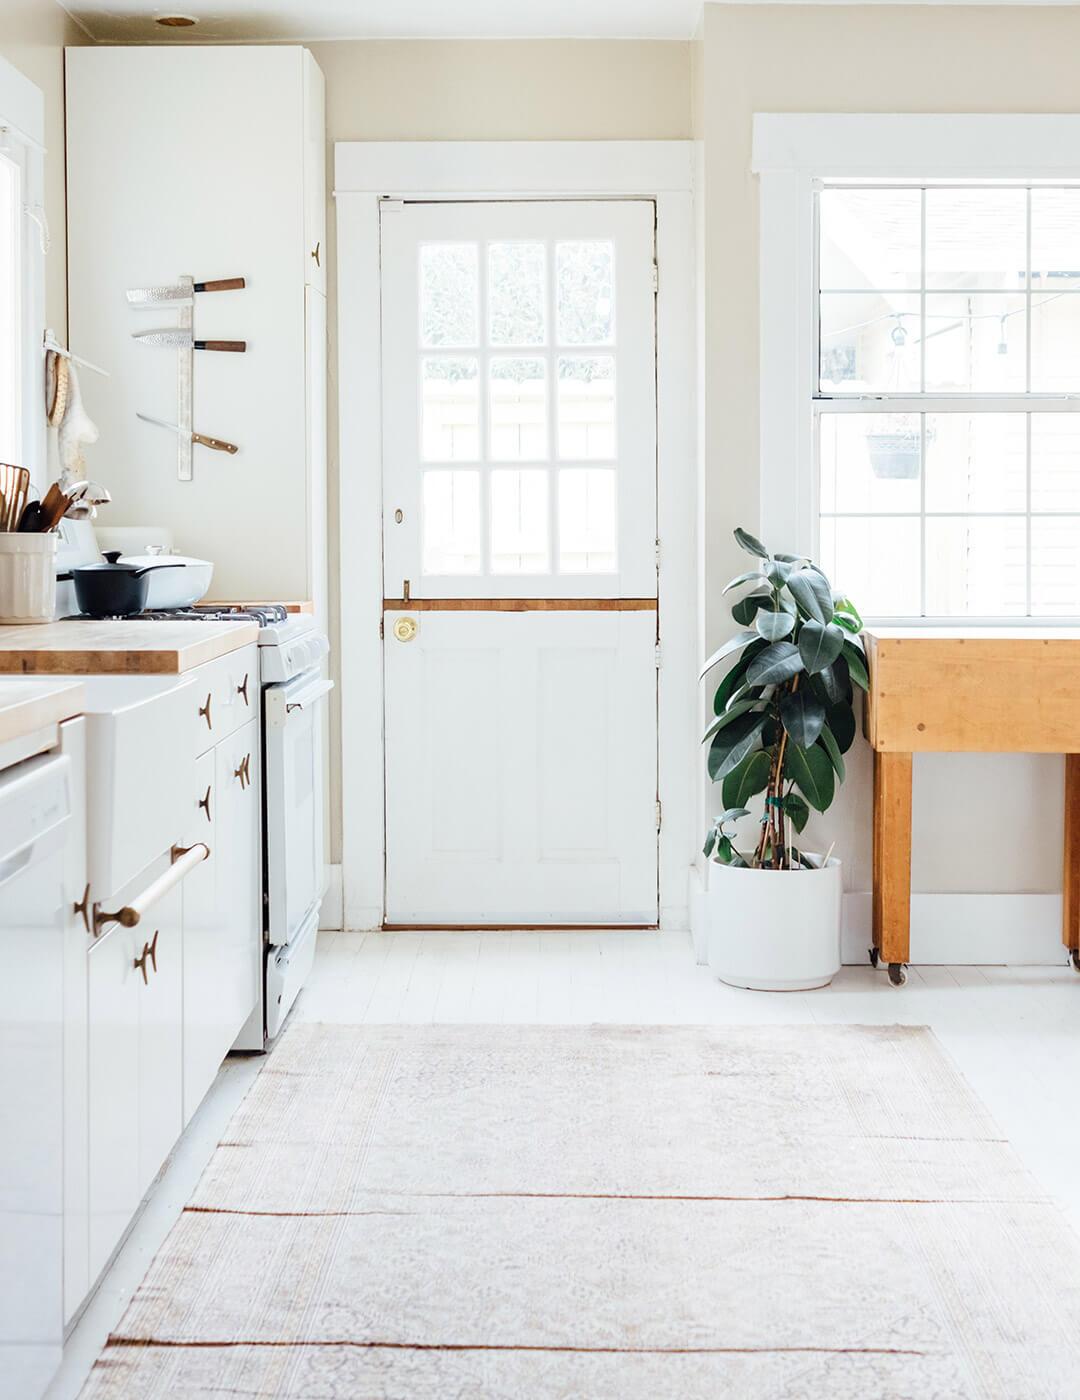 home_renovate3_portfolio6